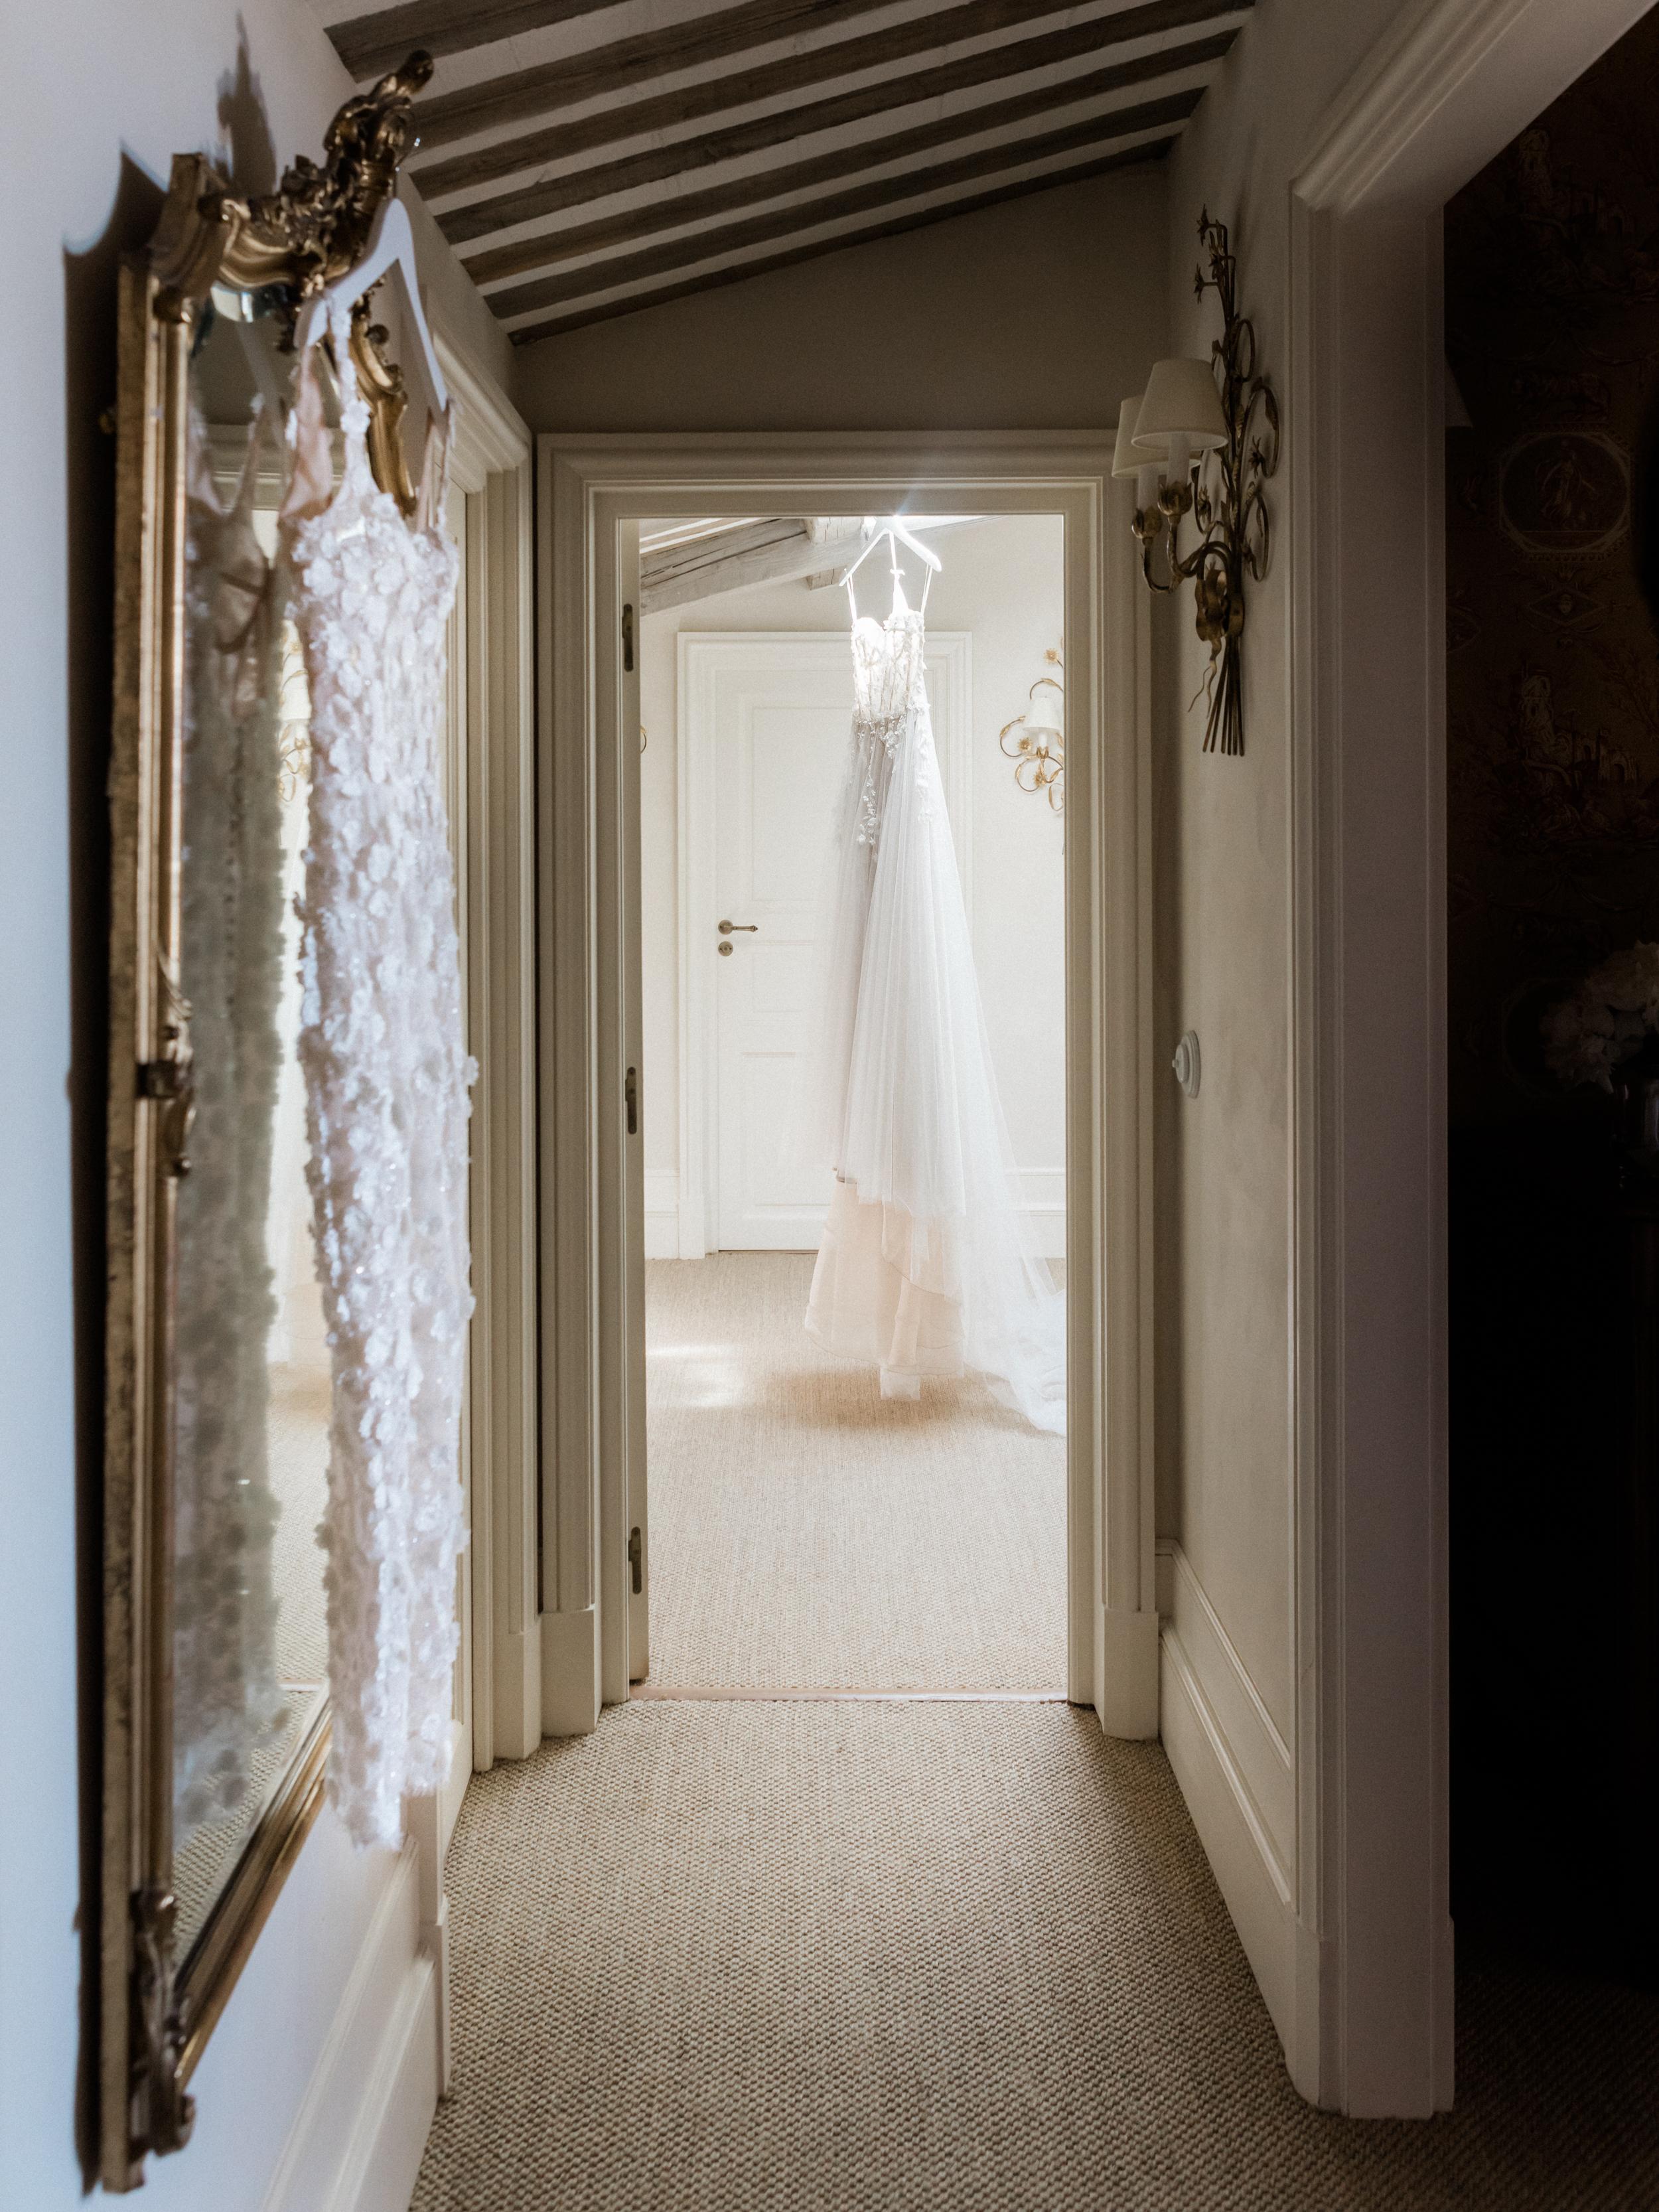 bastide_de_gordes_provence_wedding_(c)_rory-wylie-13.jpg